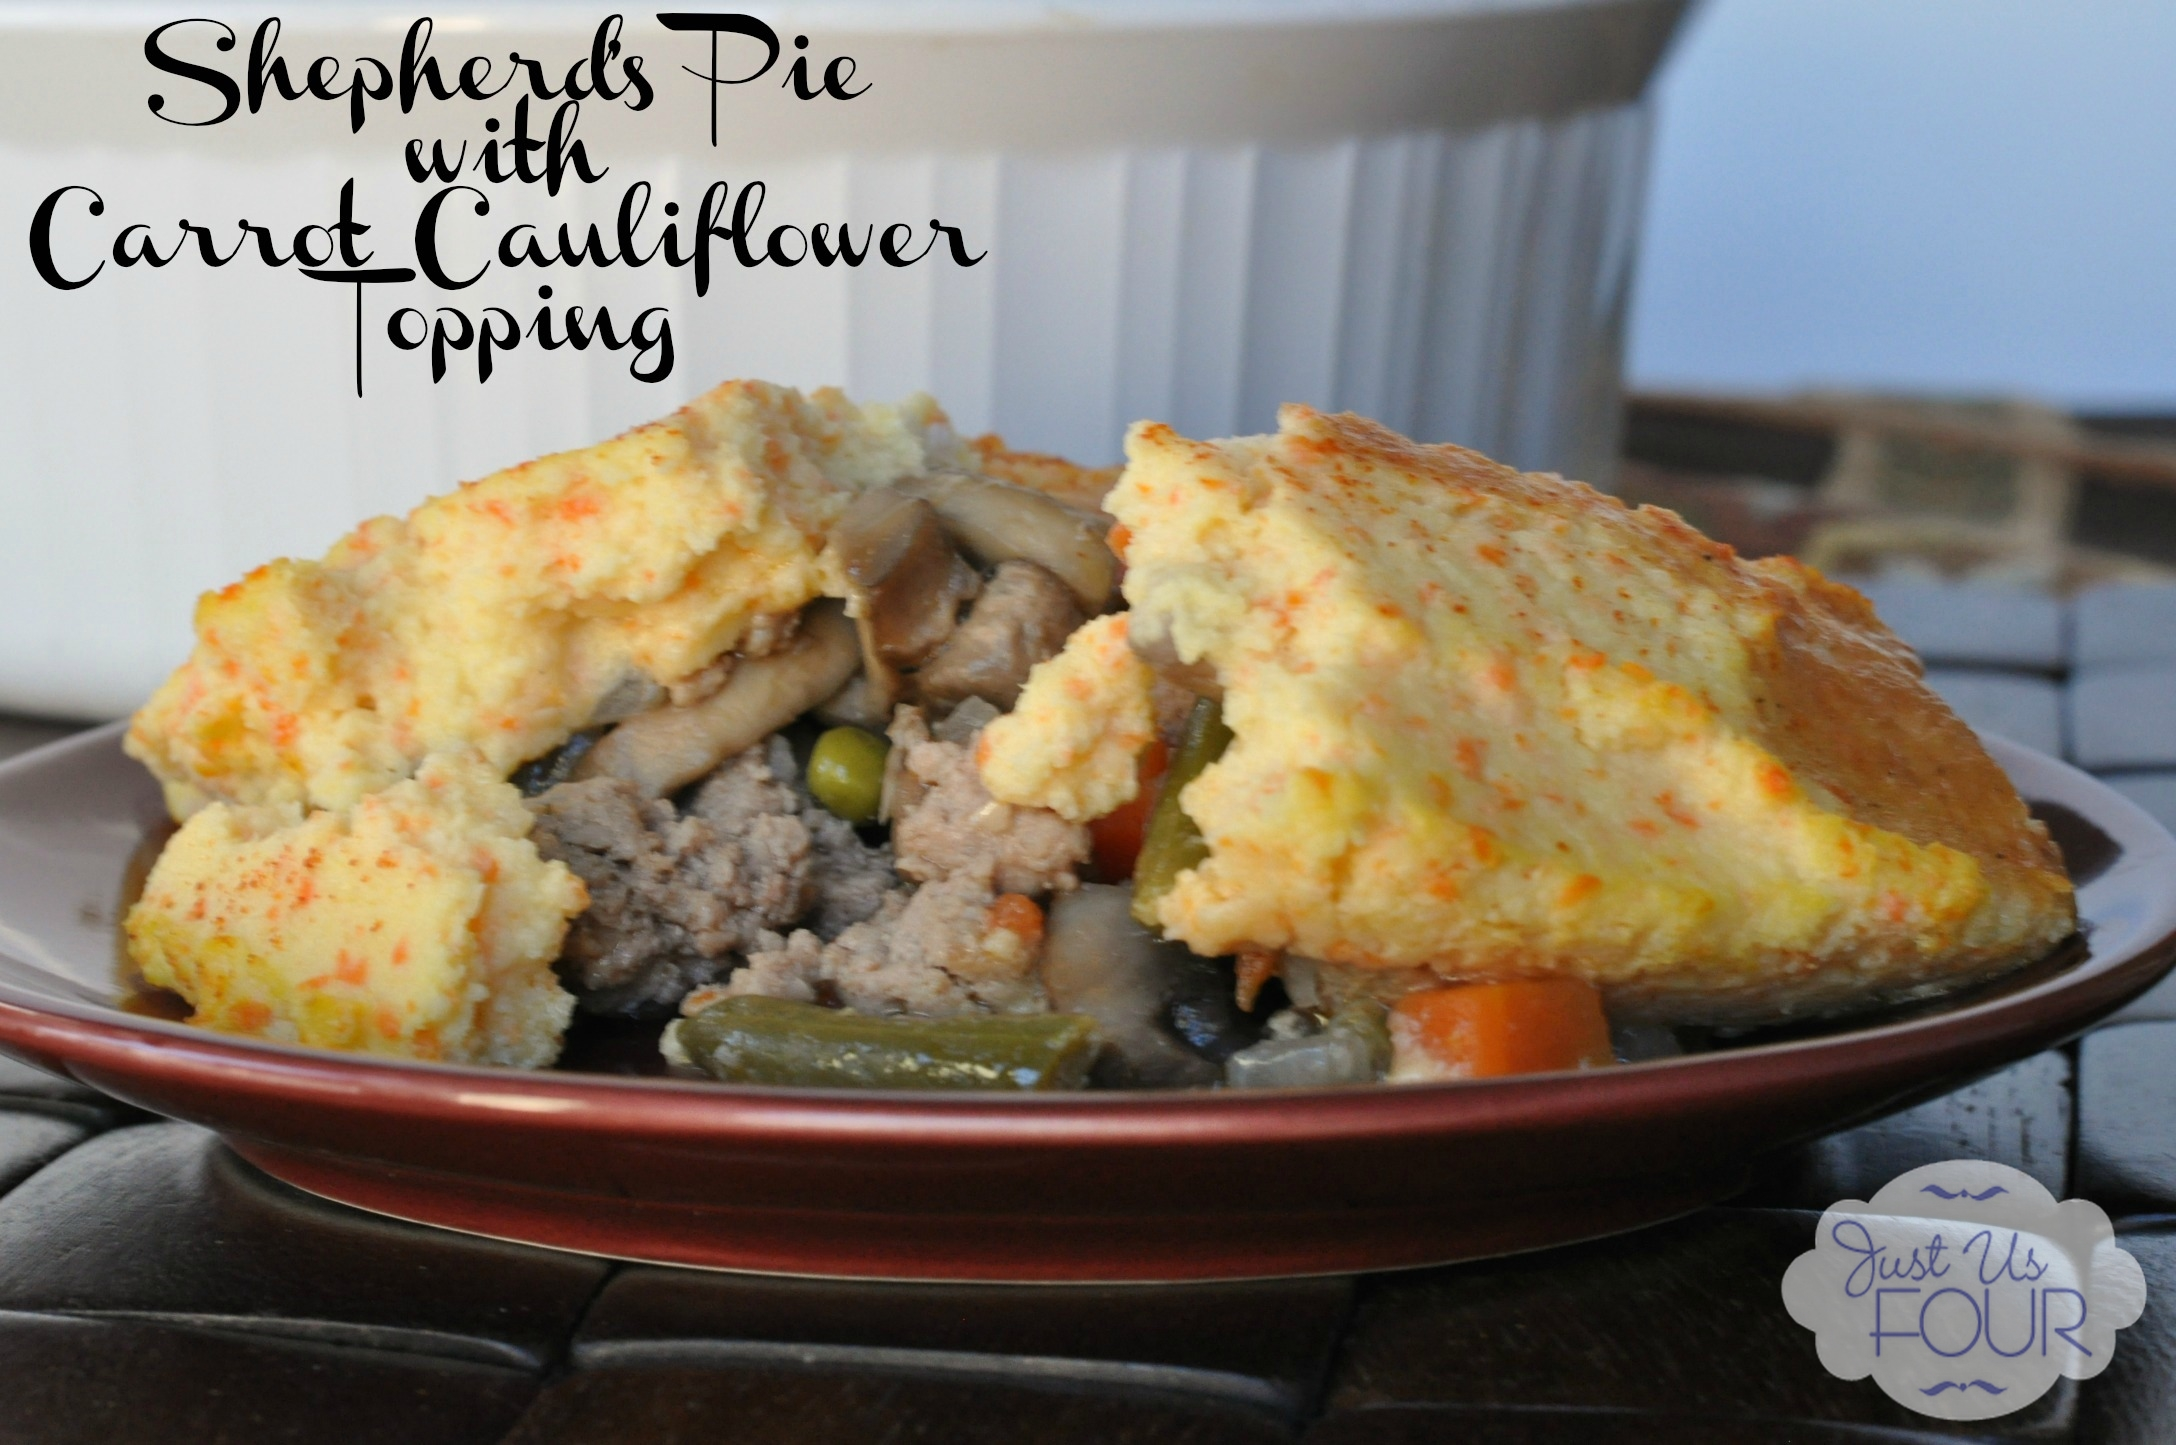 Carrot Cauliflower Shepherd's Pie - Just Us Four